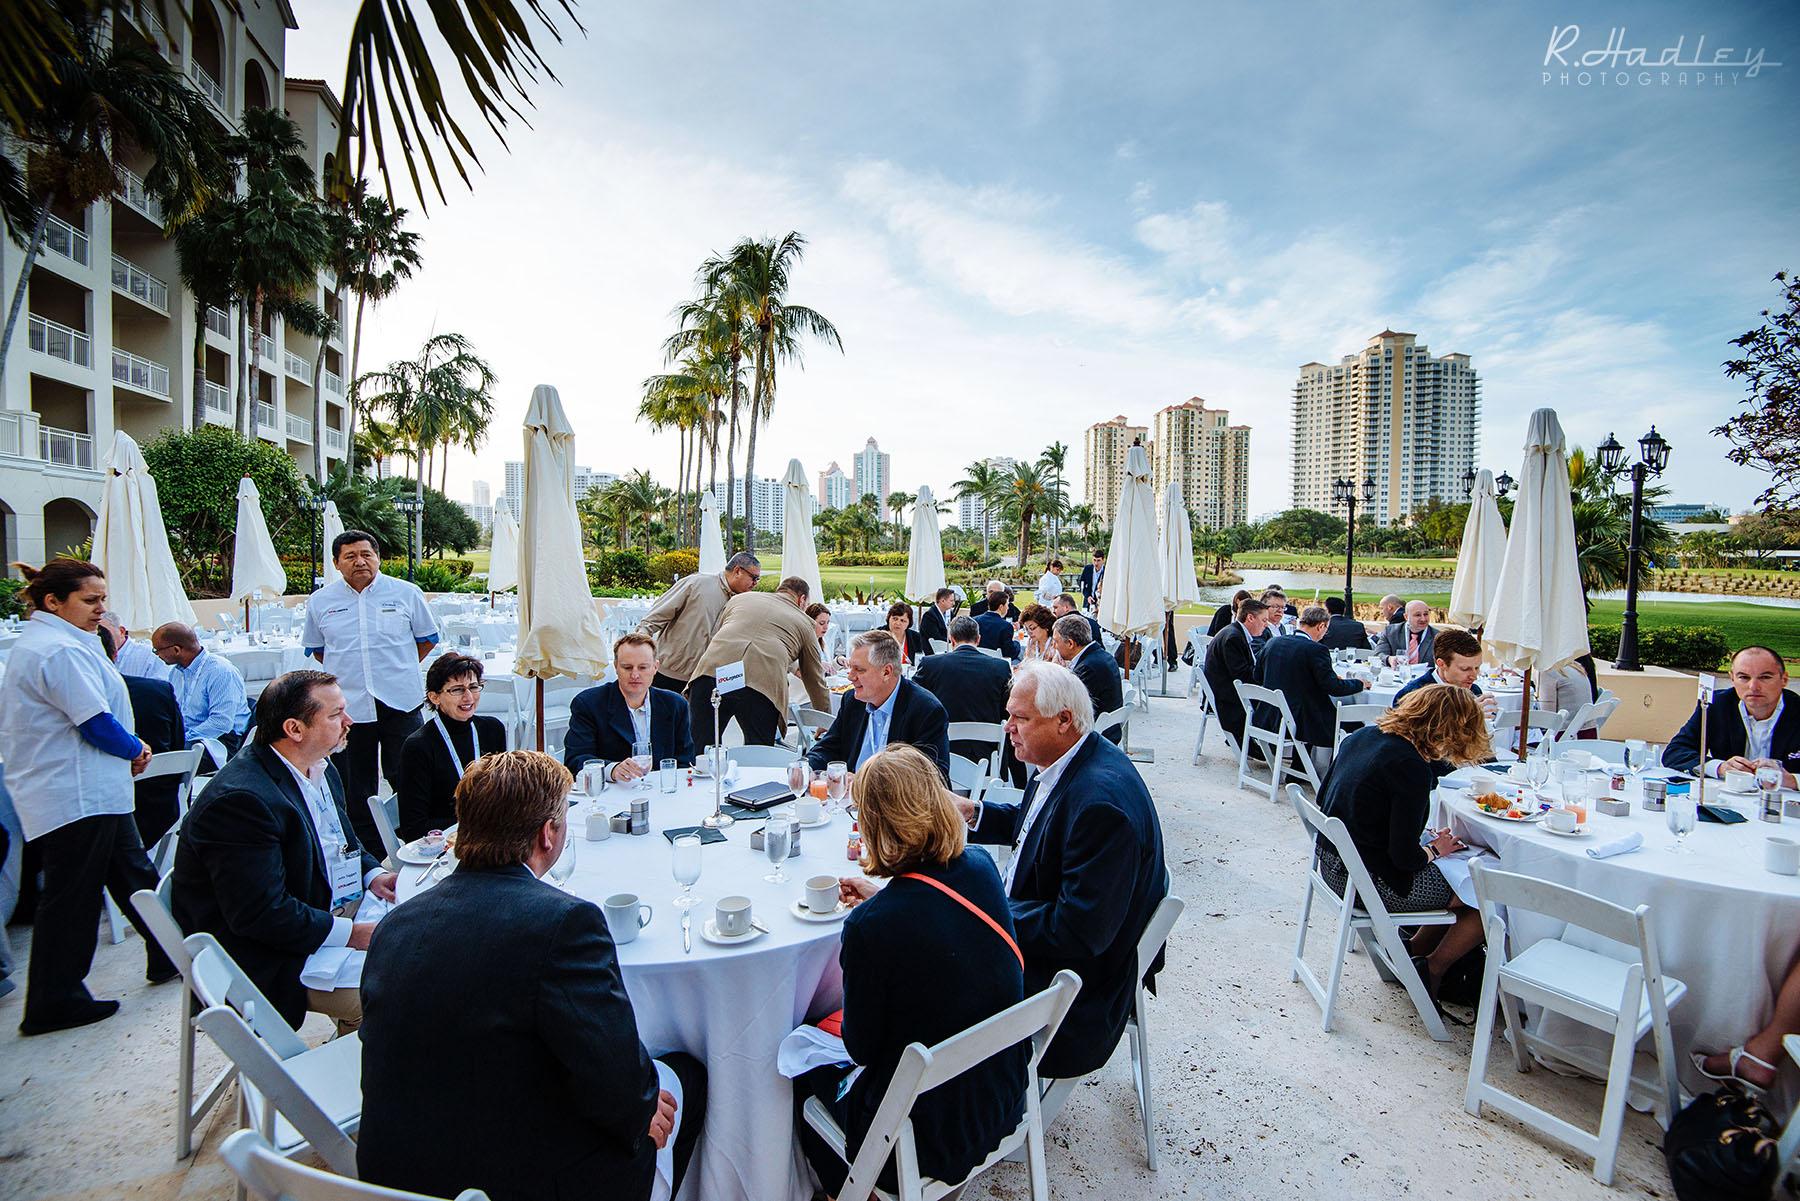 Corporate Event photographer Miami & International